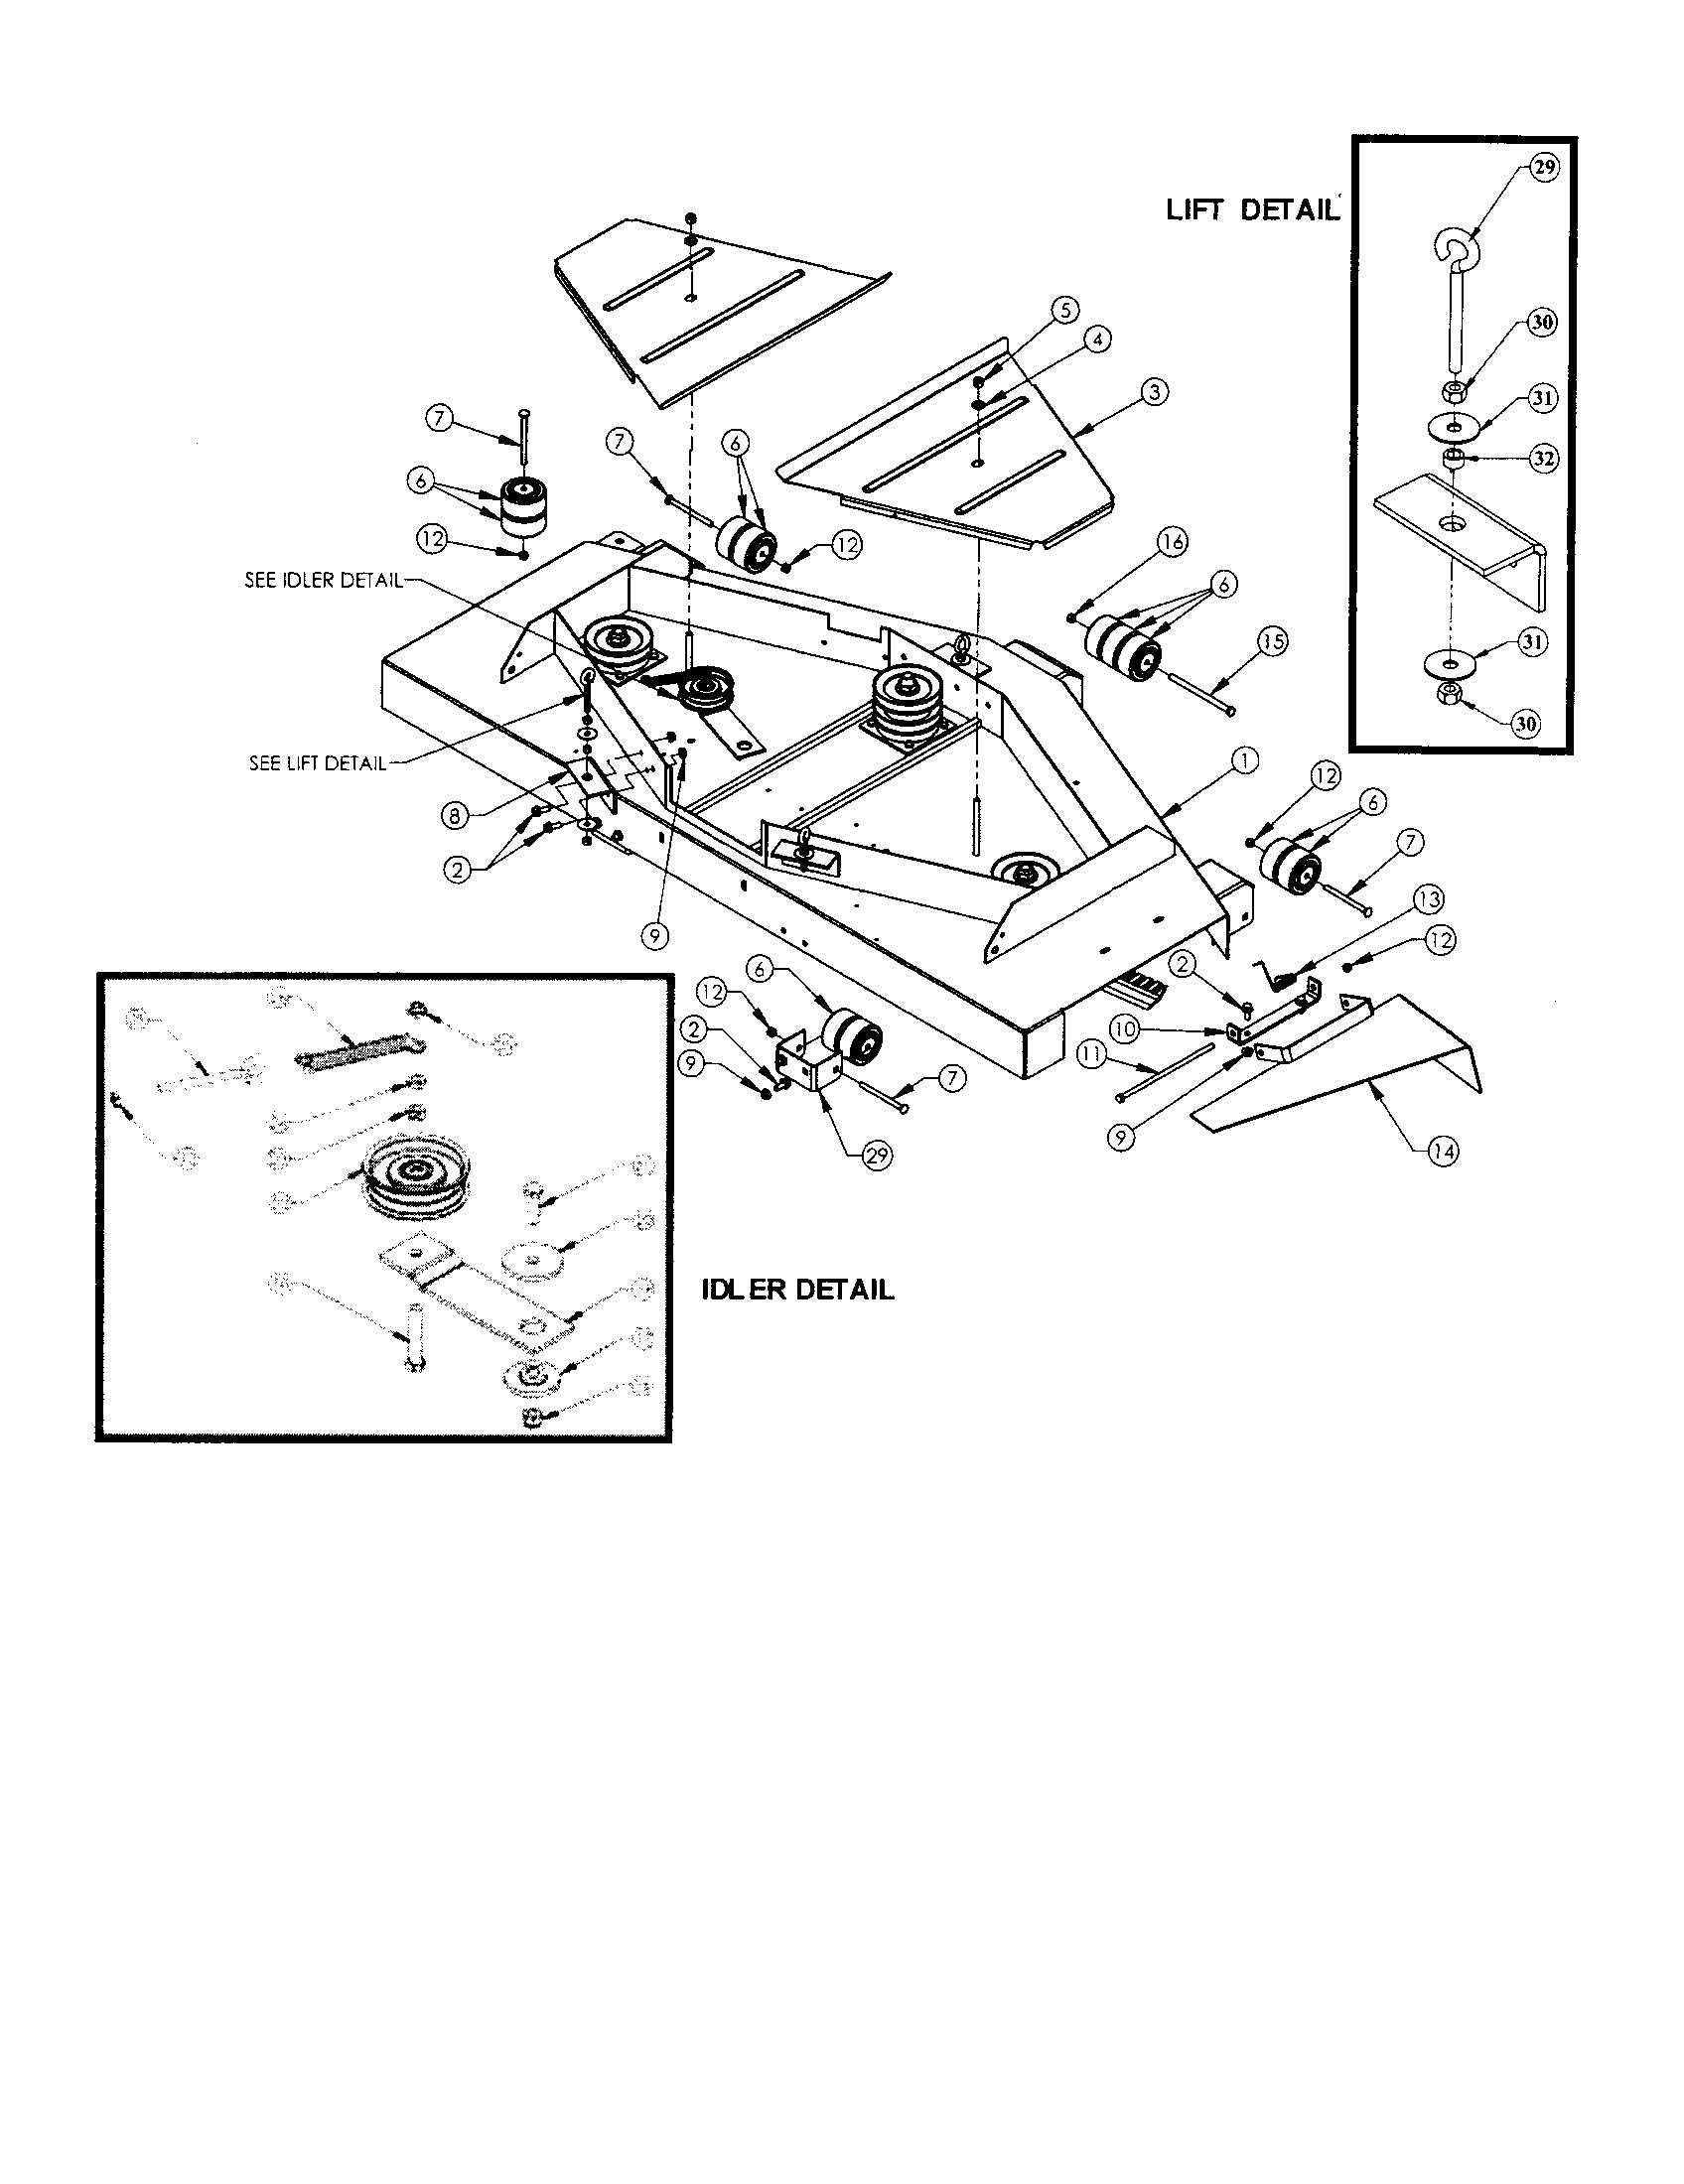 hight resolution of swisher wiring harness wiring diagram z4swisher wiring harness wiring diagram schema alpine stereo harness swisher wiring